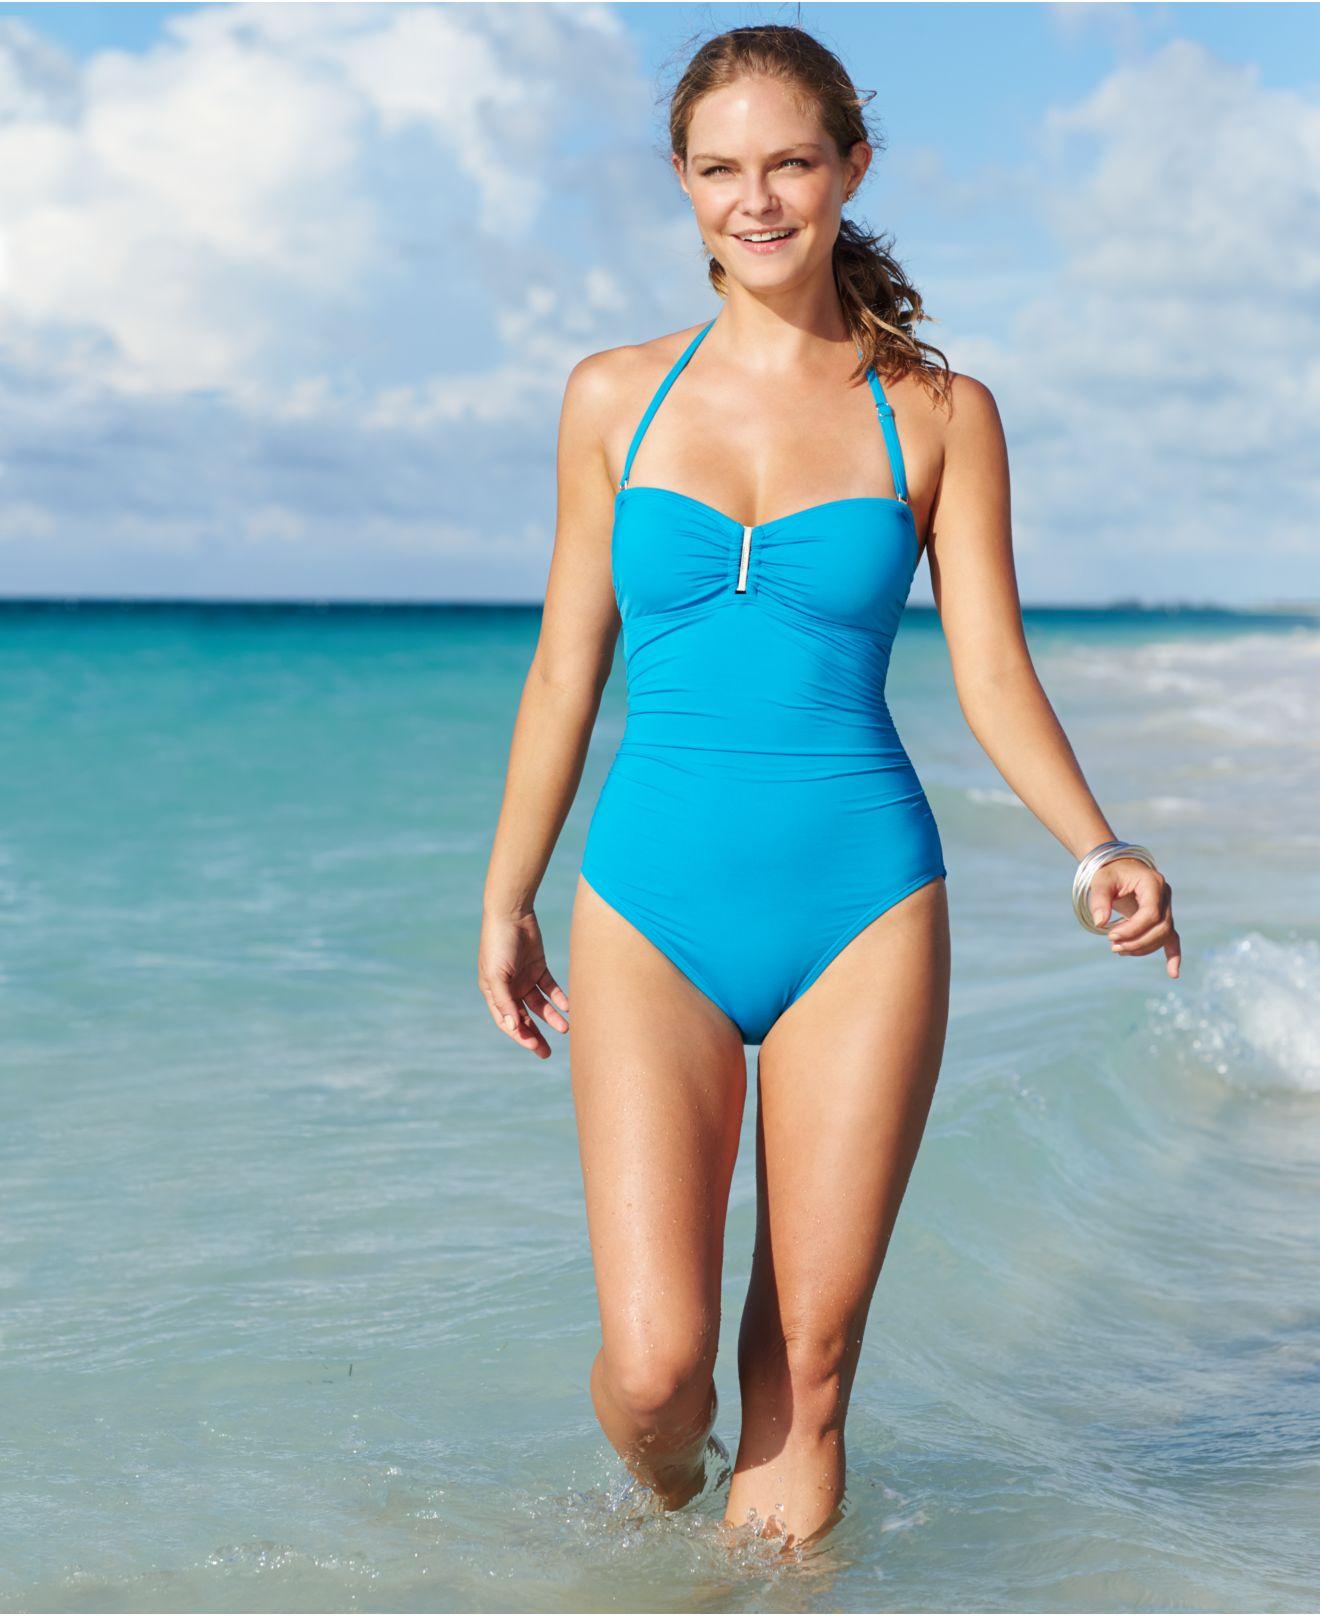 092e52906f Calvin Klein Bandeau One-piece Swimsuit in Blue - Lyst